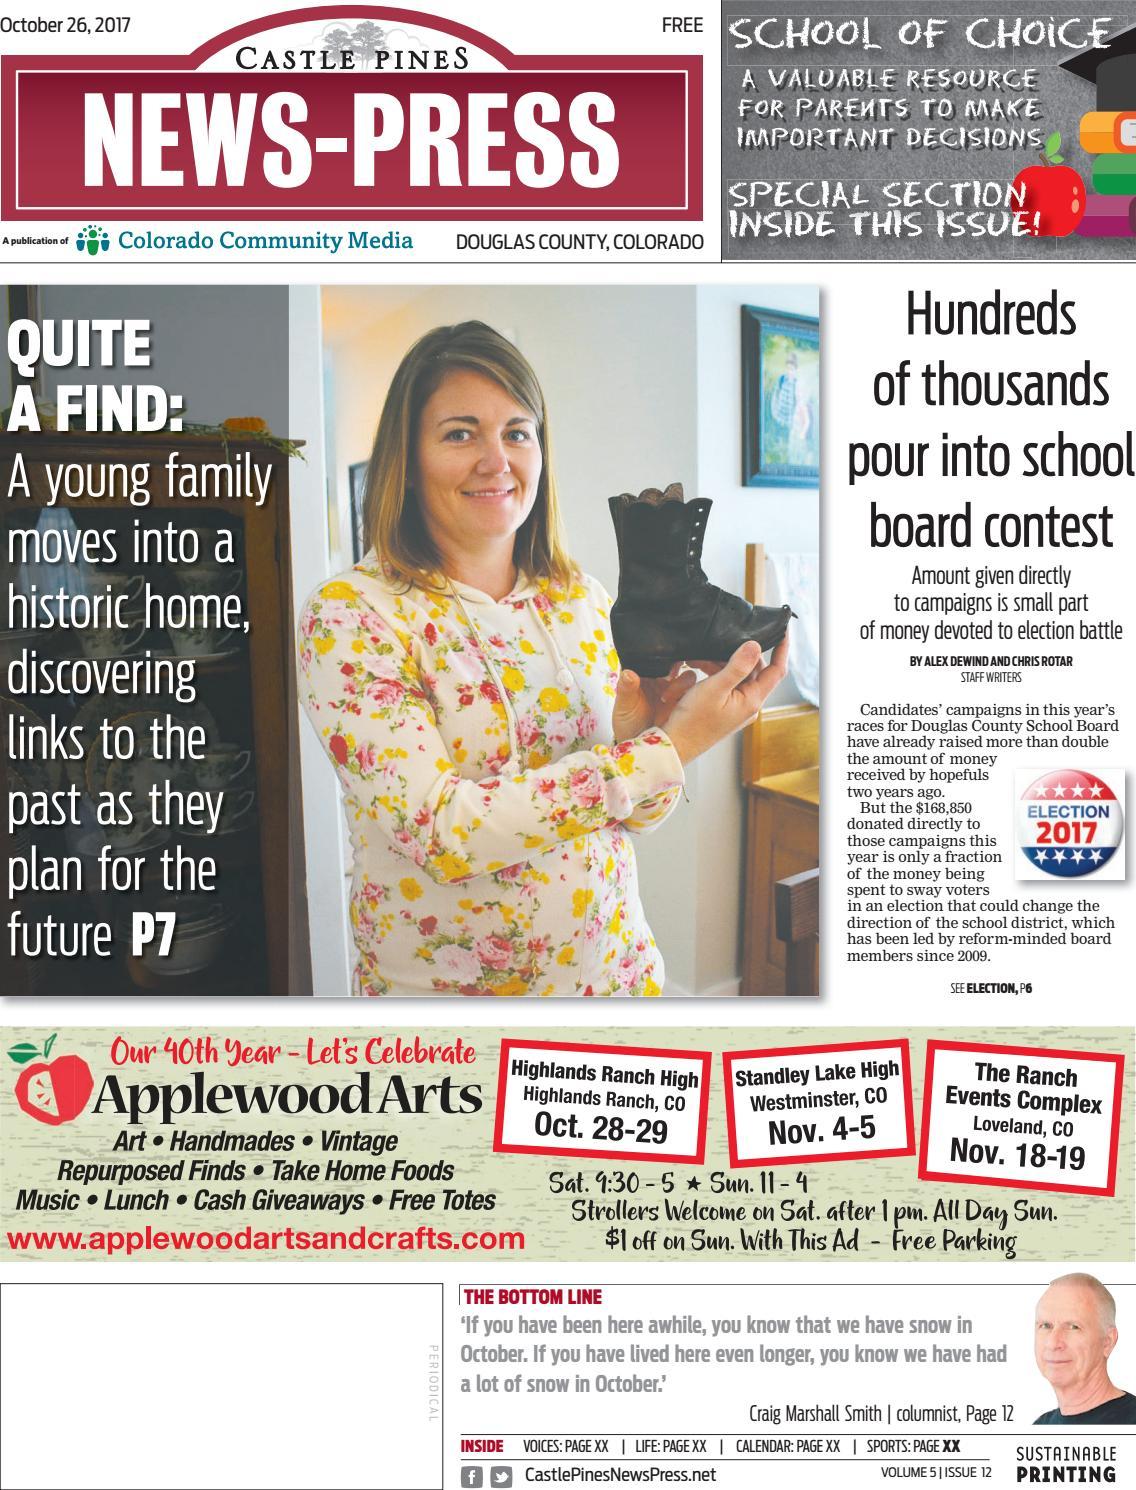 News Press 1026 Community issuu Castle Media Pines by Colorado tsQdChrxB